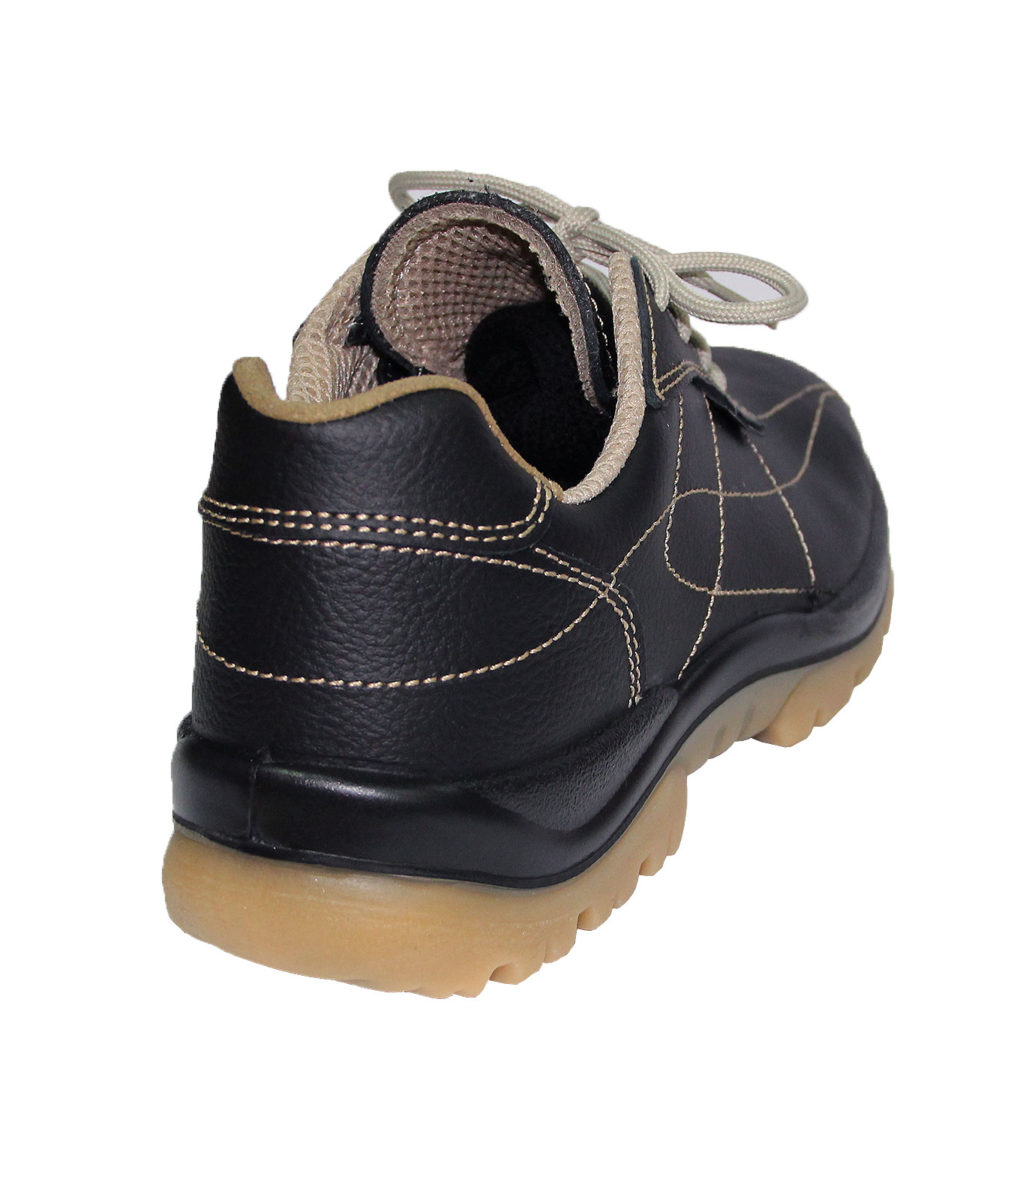 Tropea παπούτσια εργασίας 4